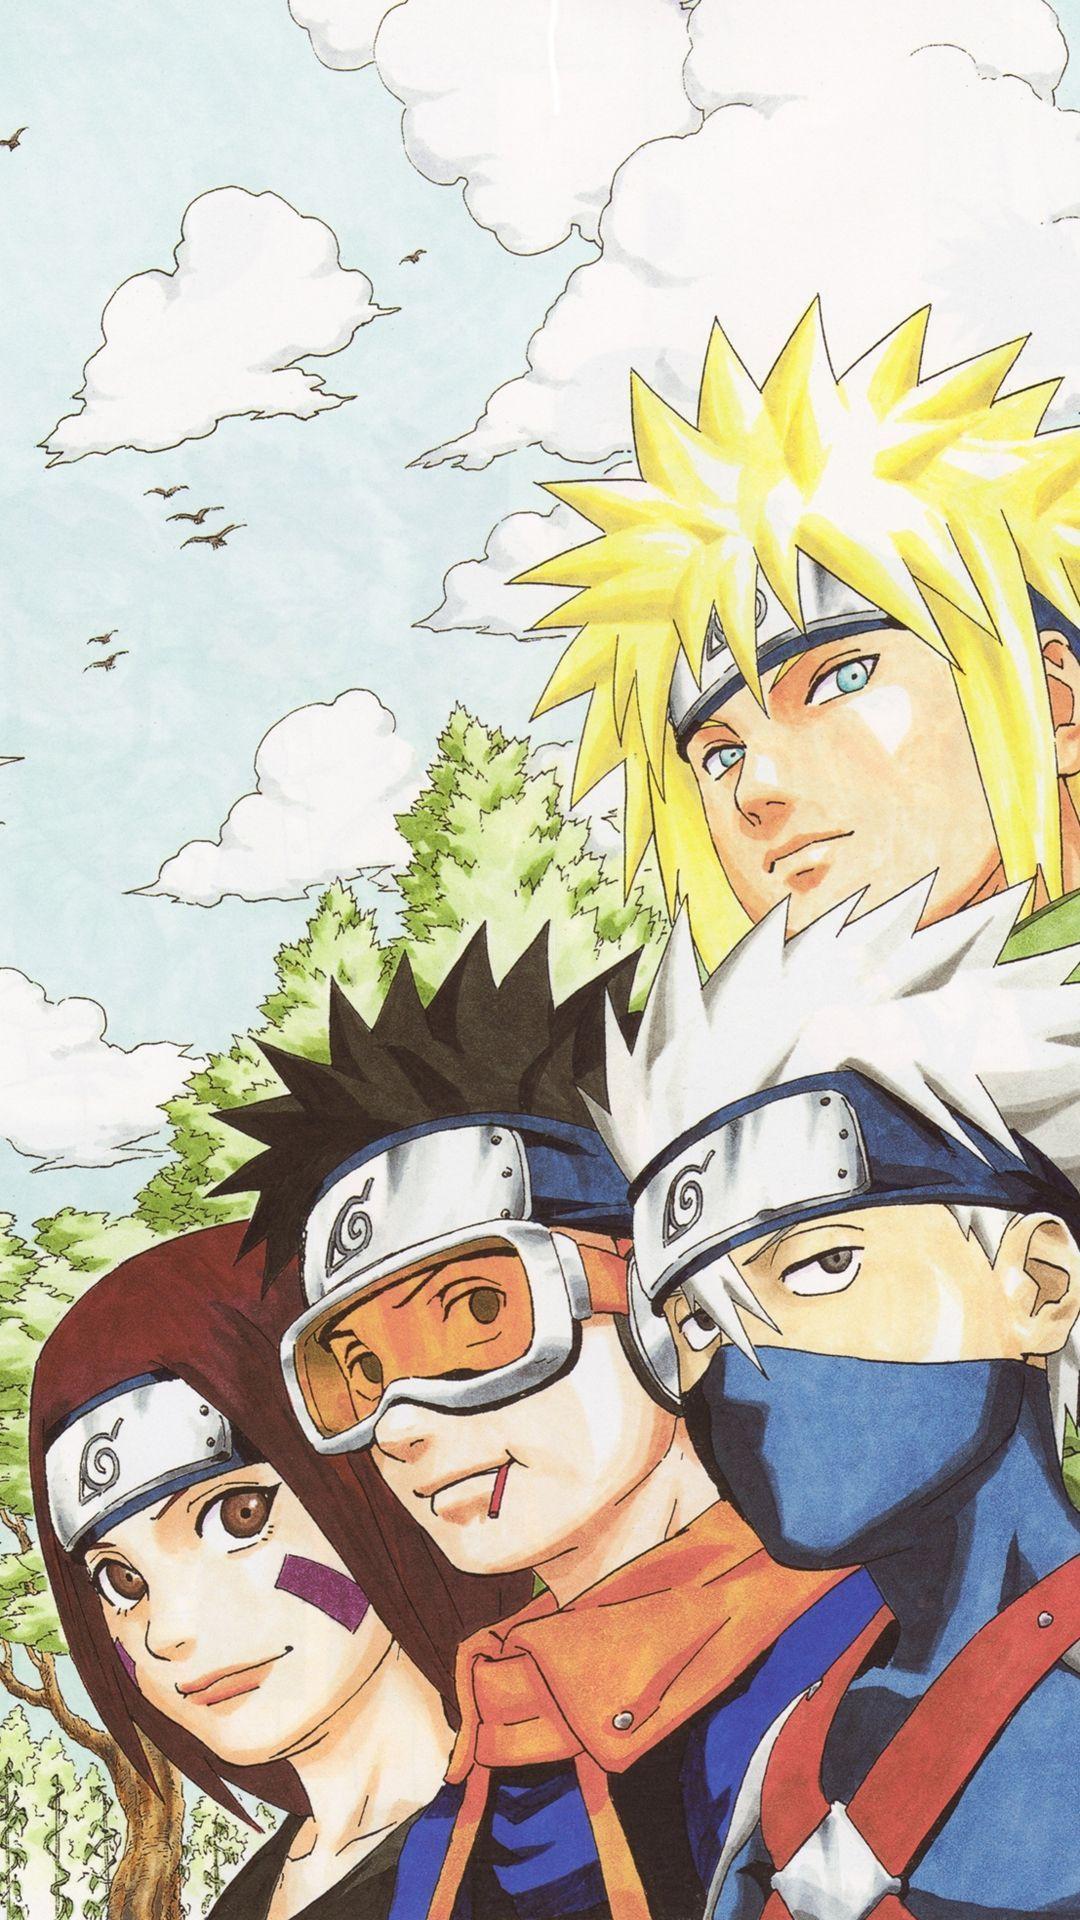 Kakashi Obito And Rin Naruto Shippuden Iphone Wallpaper